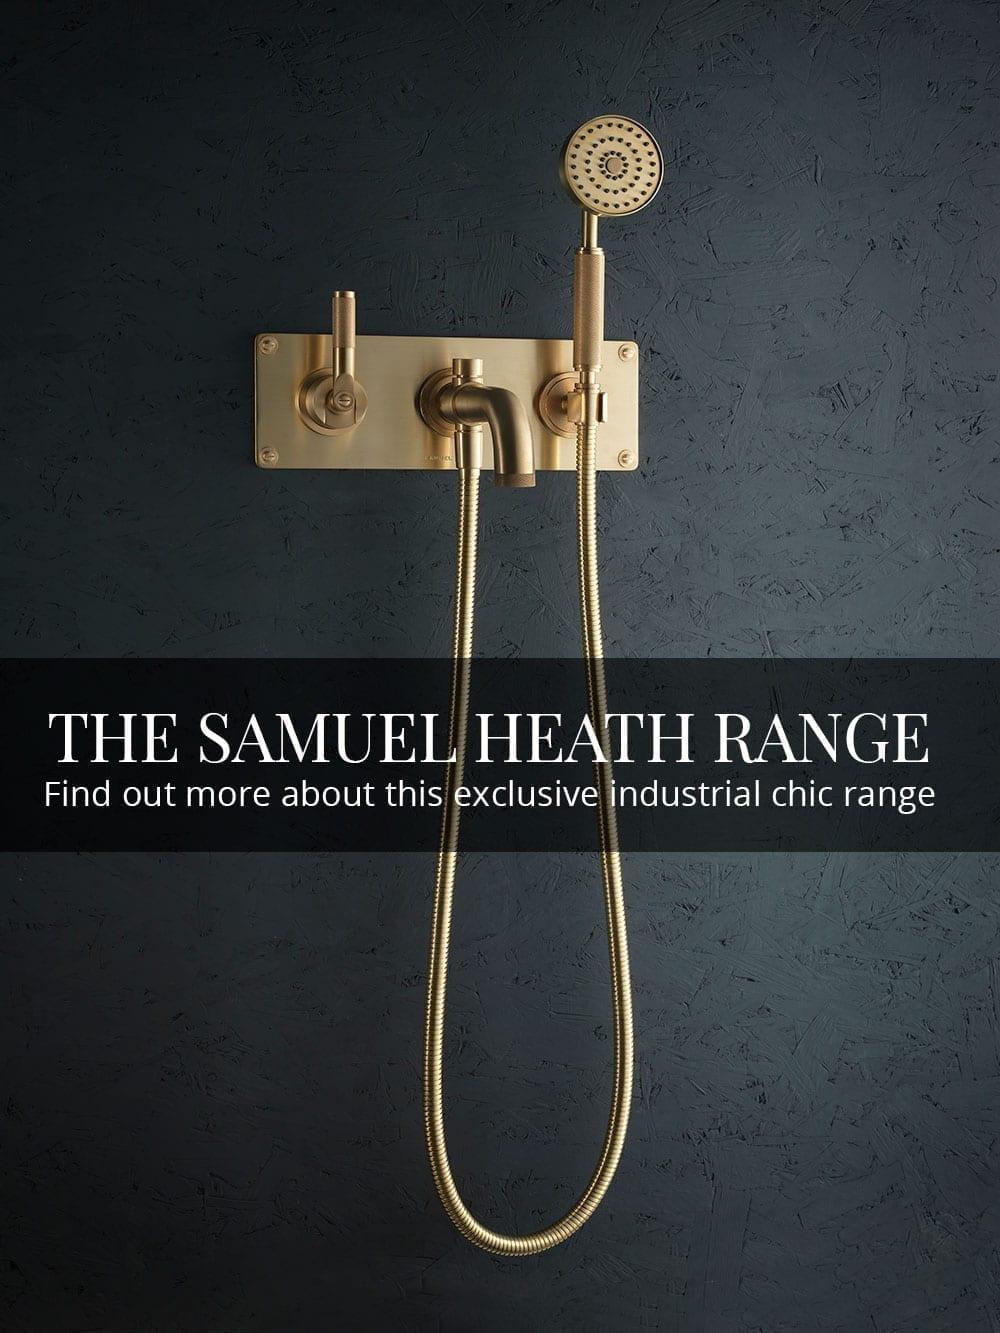 SAMUEL HEATH RANGE